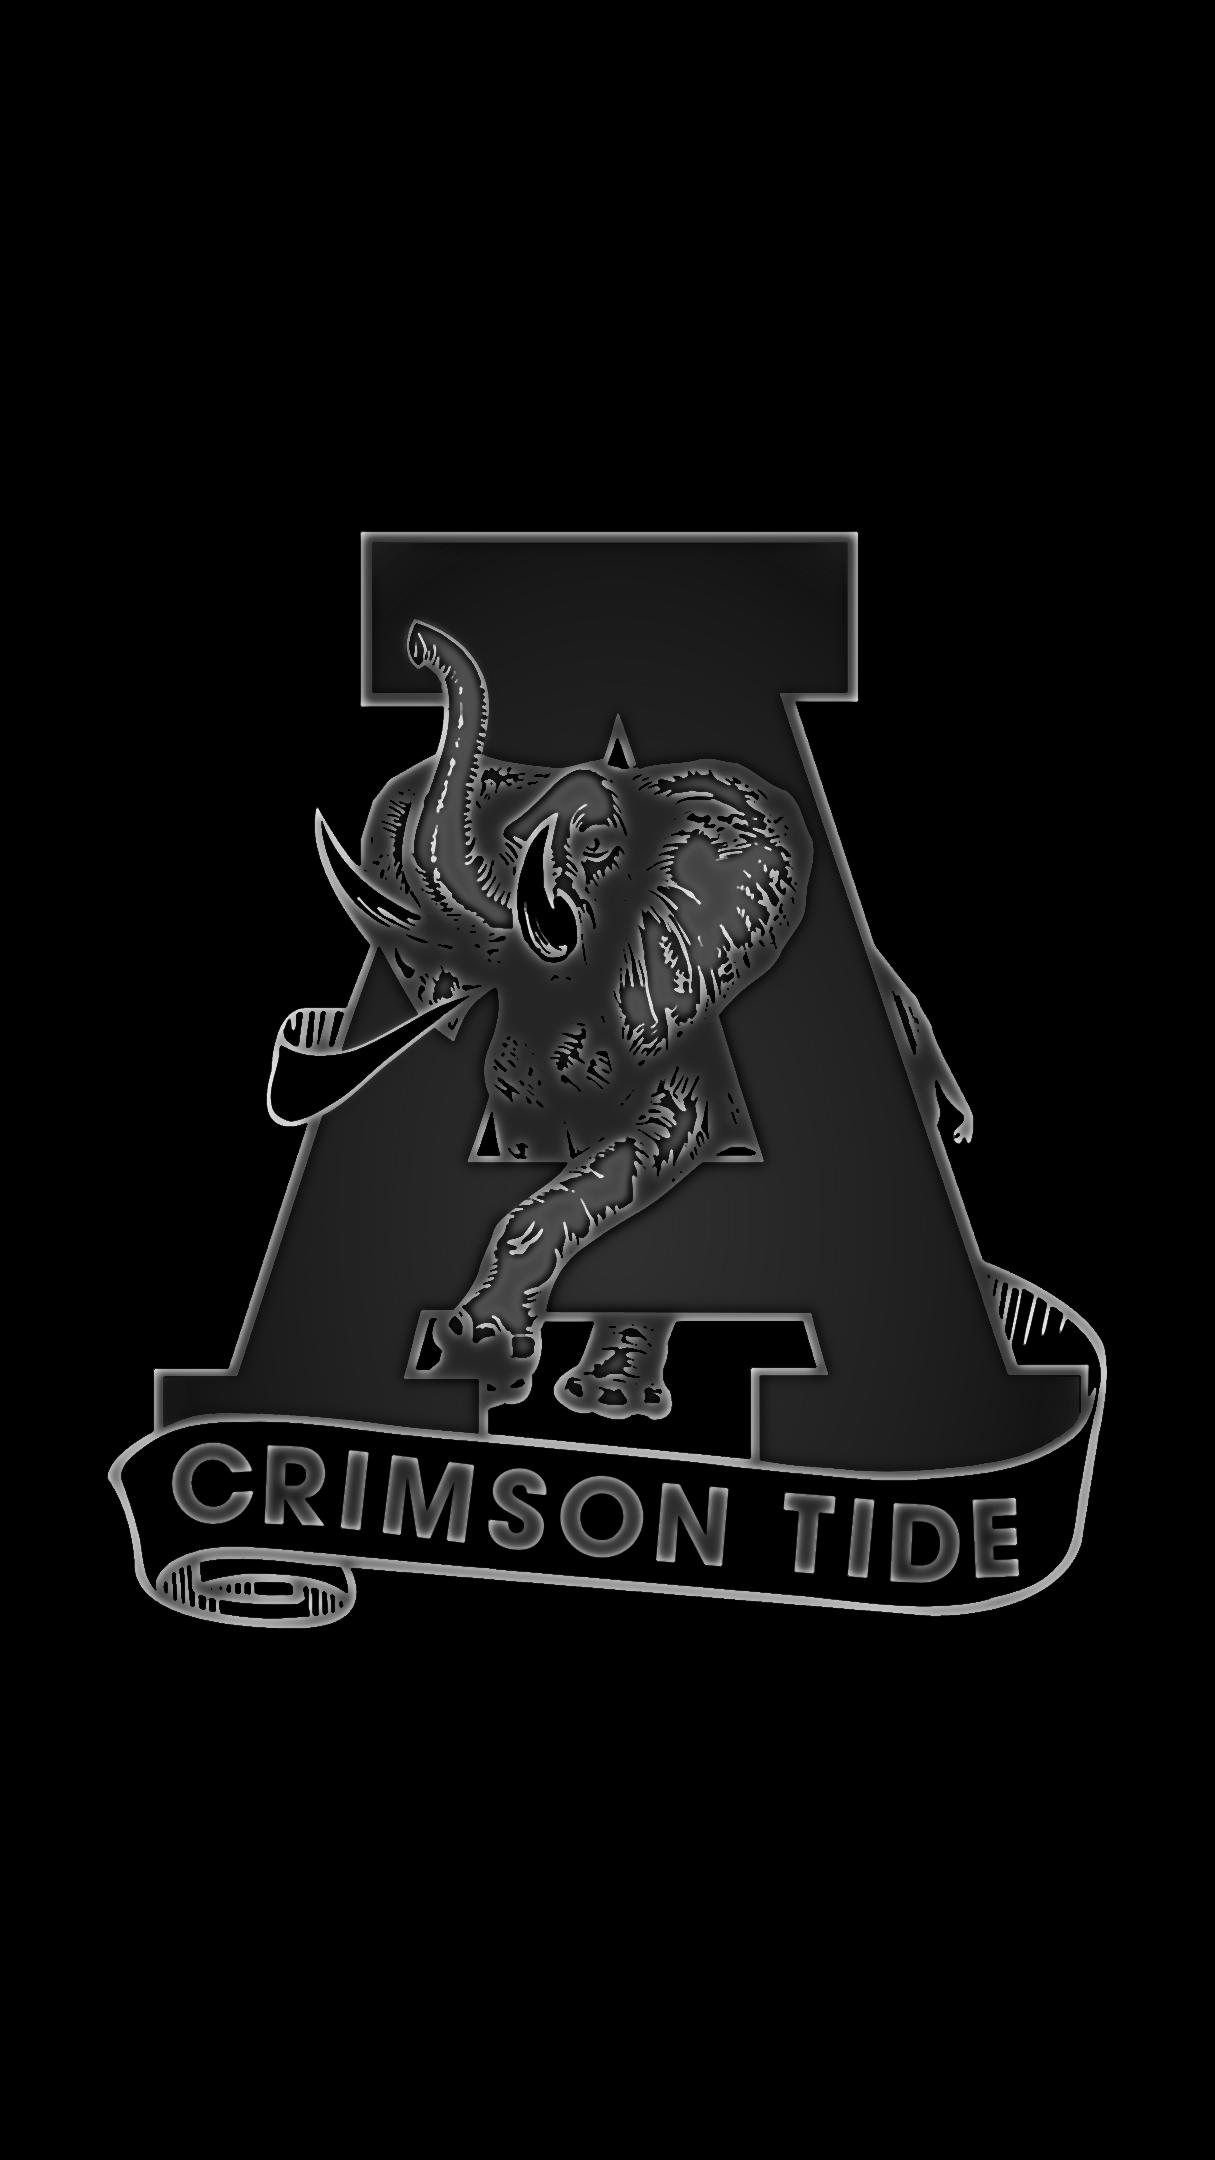 Alabama Crimson Tide Football Wallpaper Iphone Android 23 High